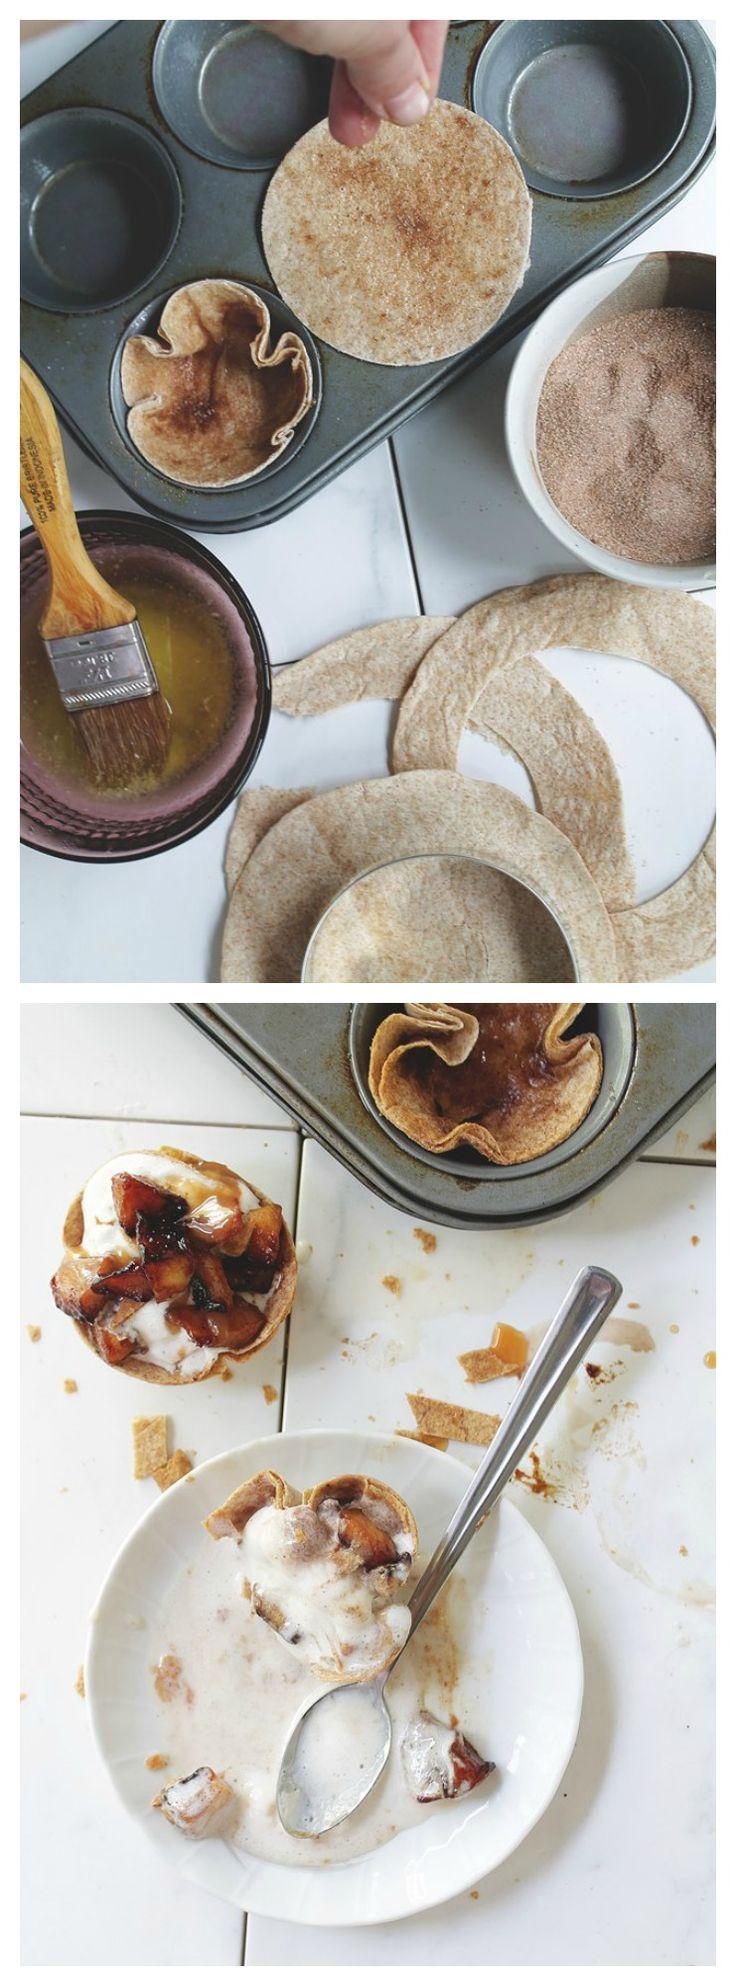 Apple Pie a la Mode in Cinnamon Tortilla Cups | www.diethood.com | Quick, easy, and delicious!!